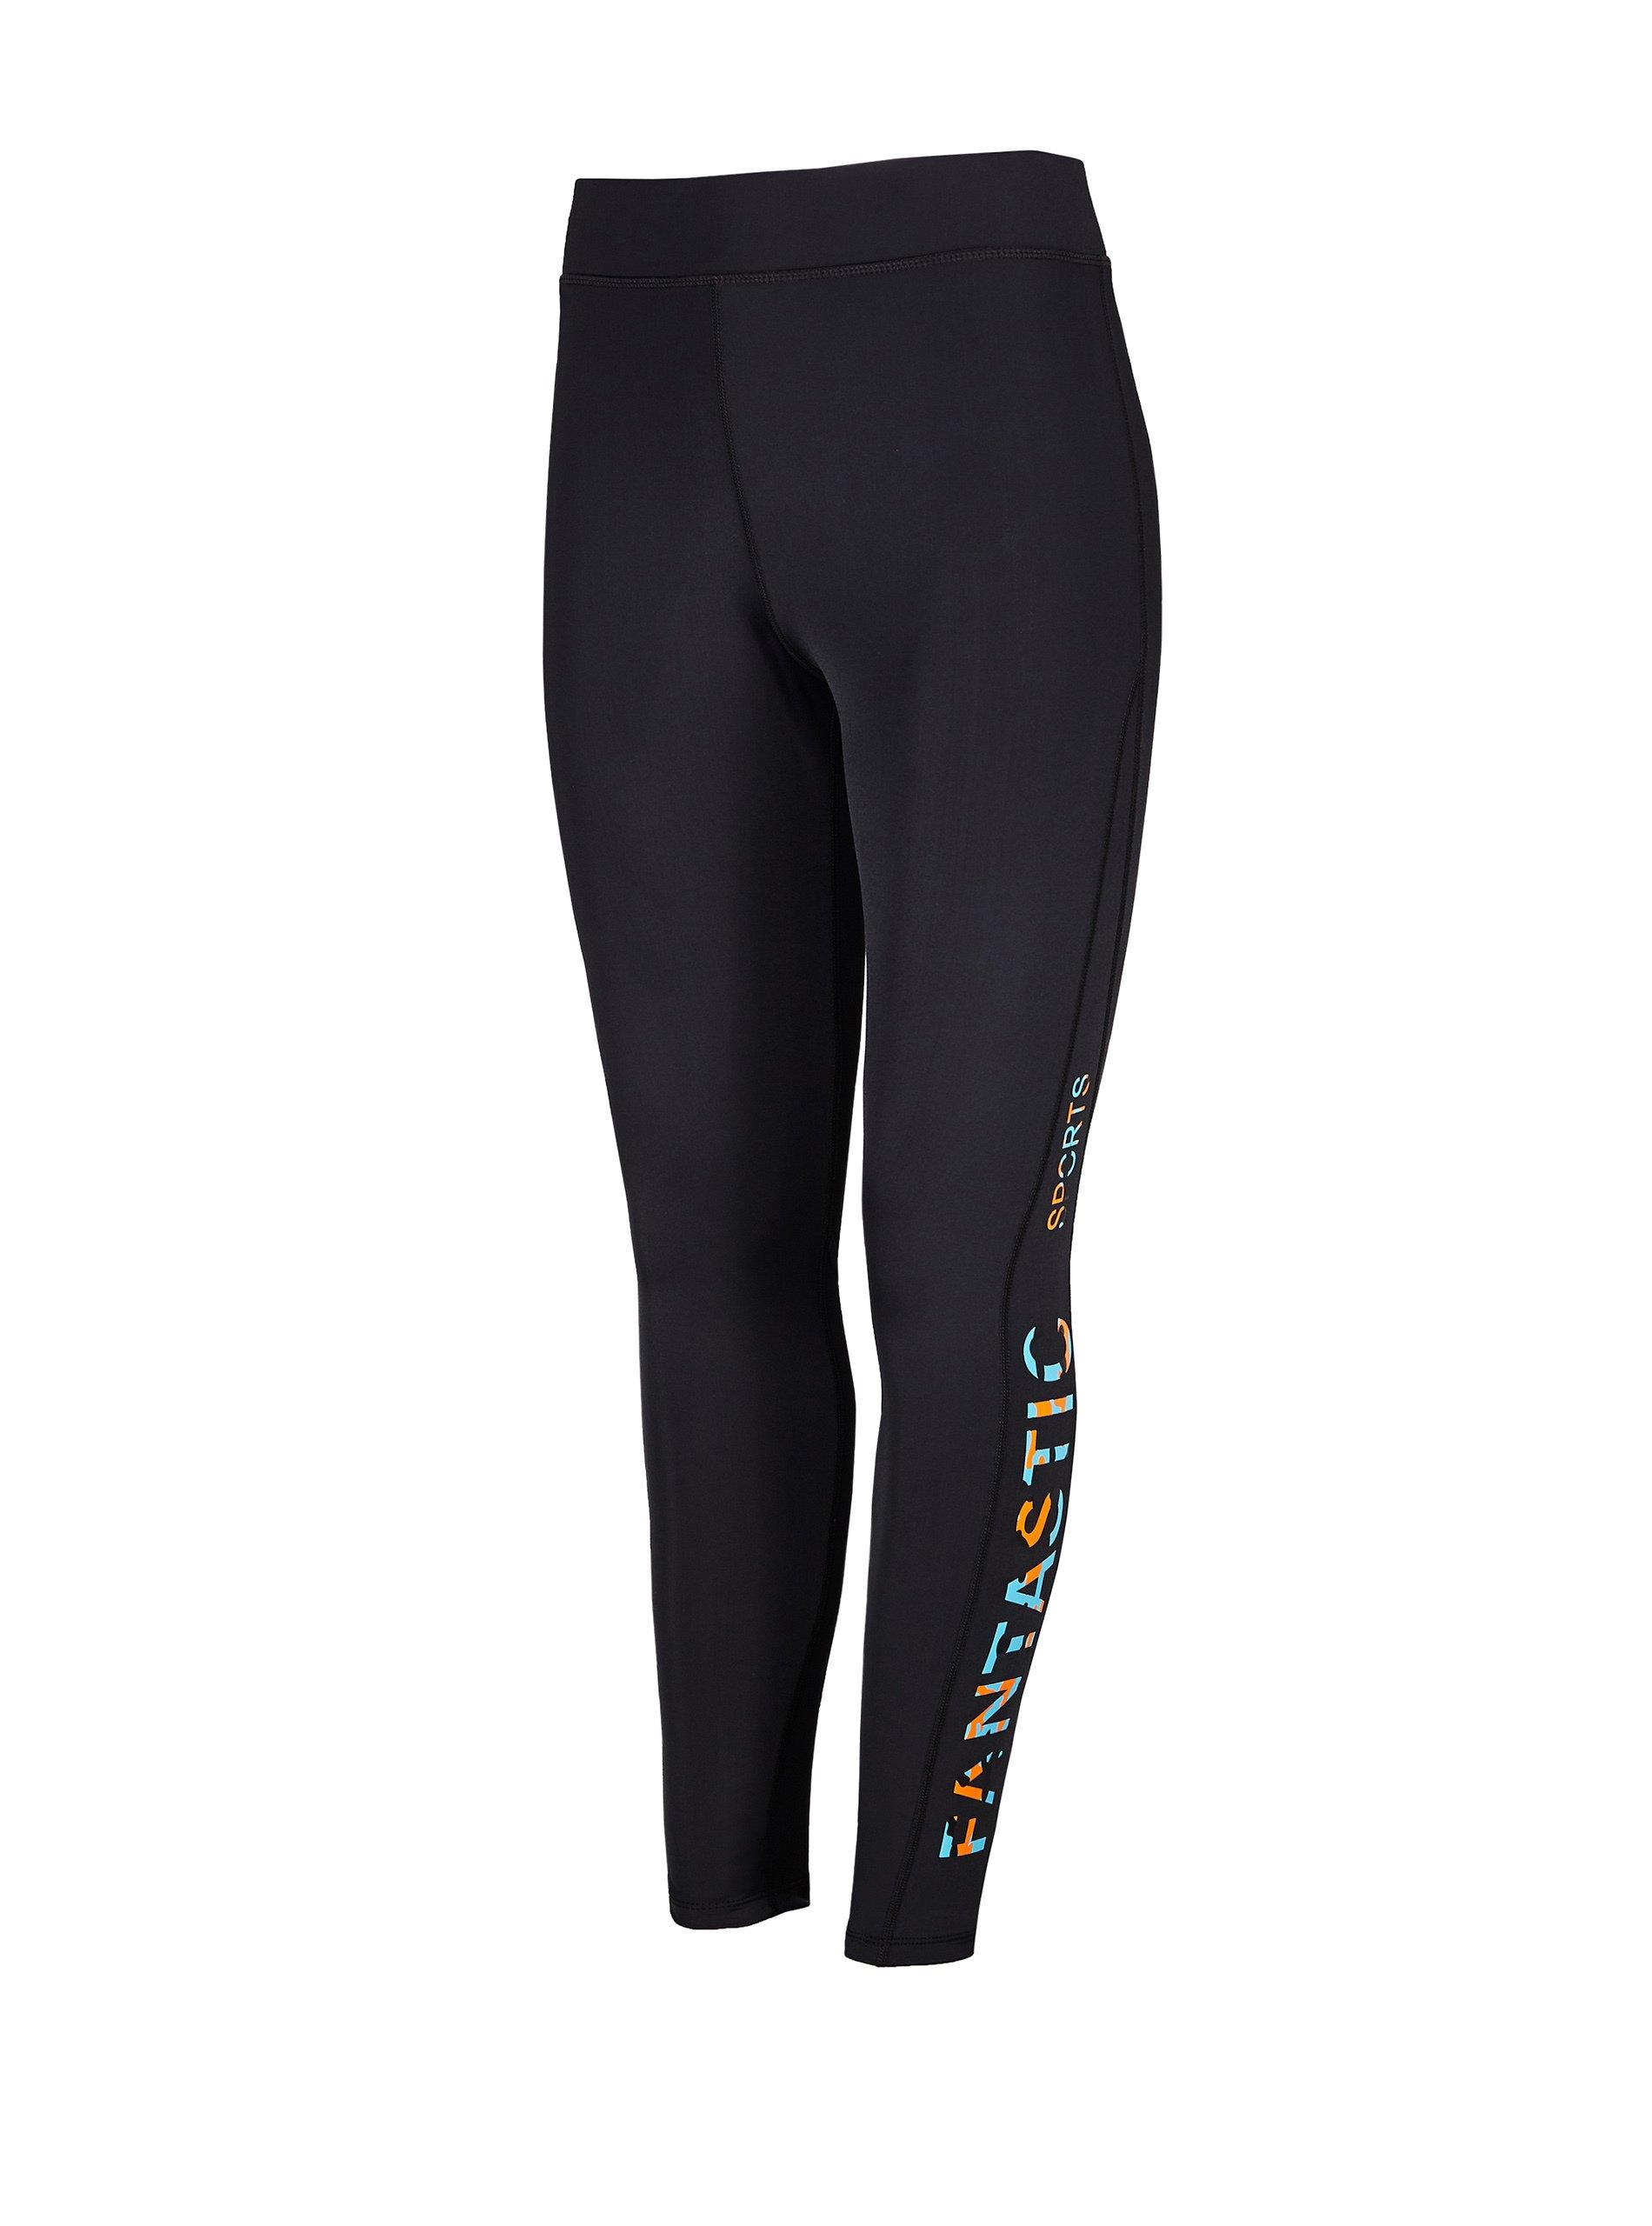 Scodi Women's Surfing Leggings Swimming Tight Pants